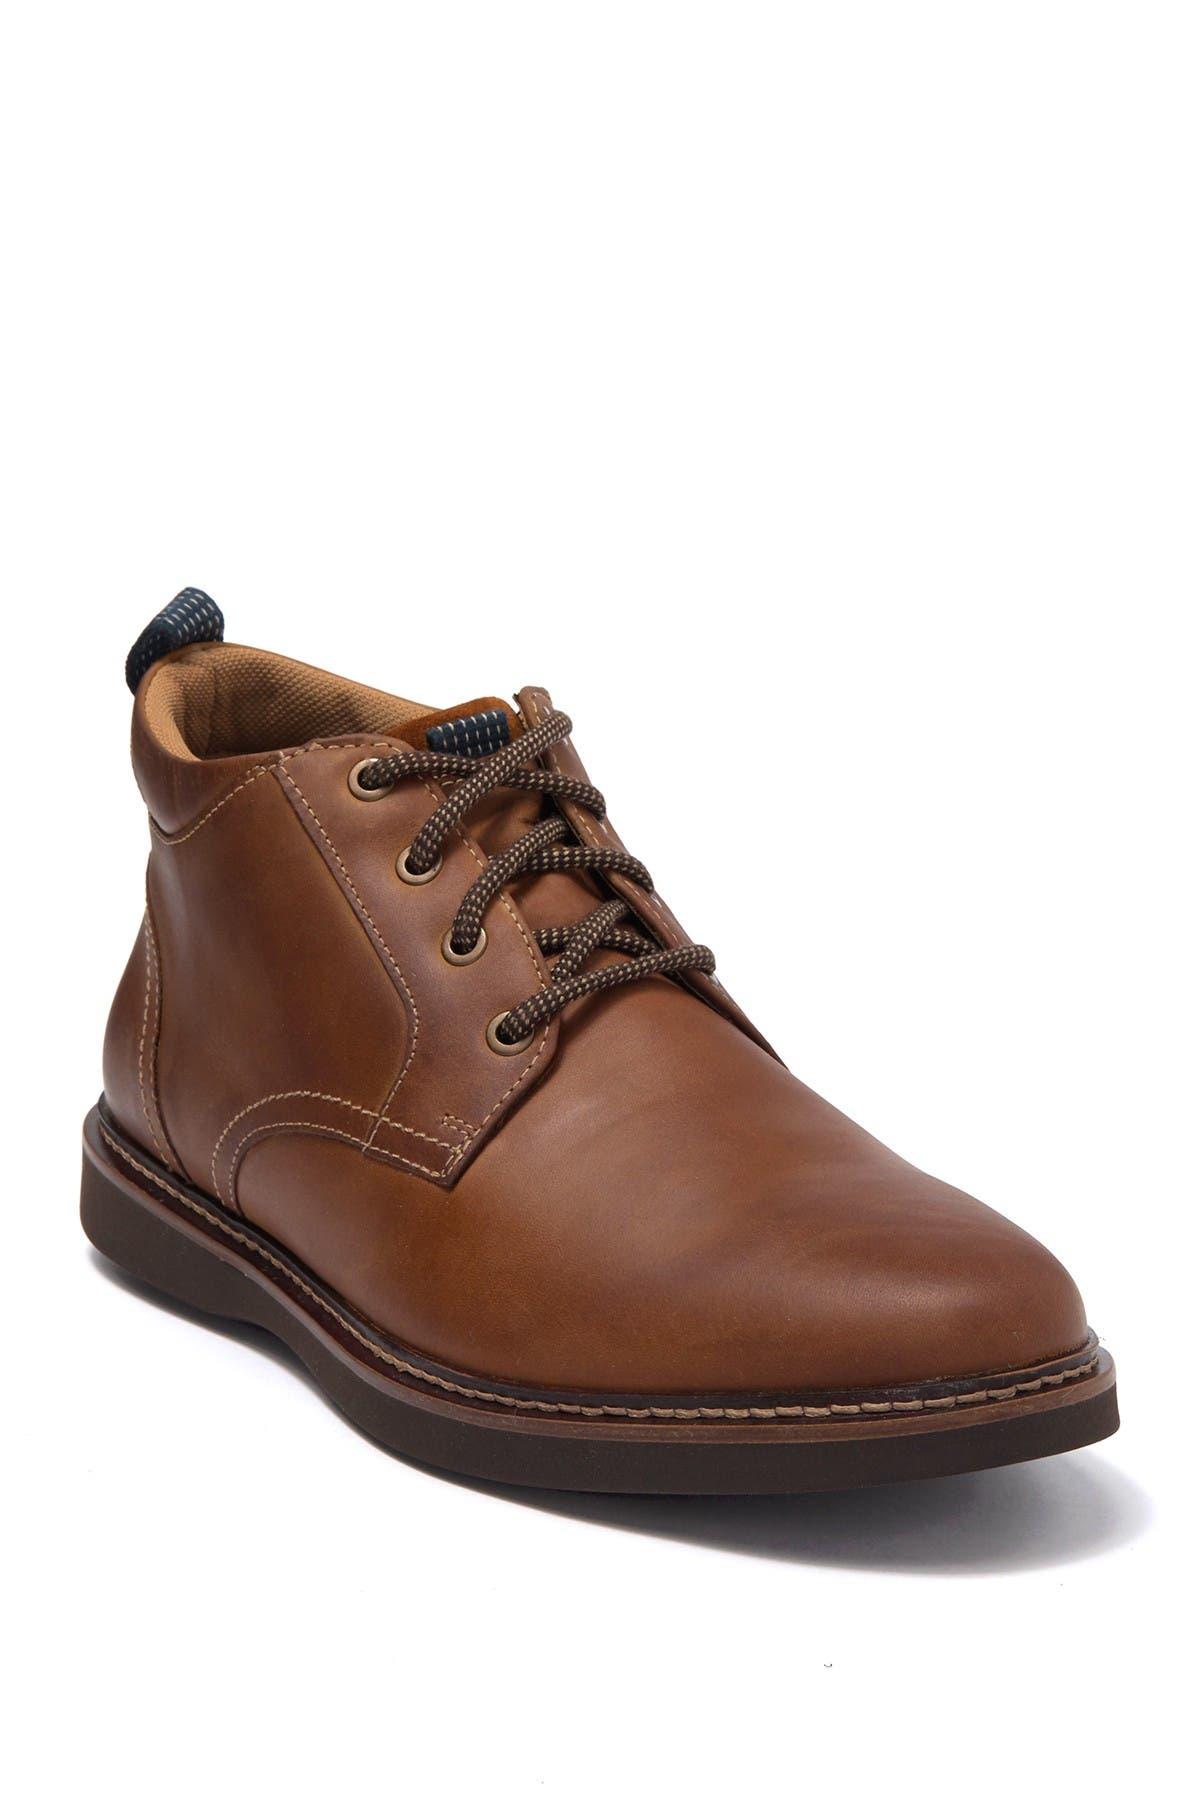 Image of NUNN BUSH Ridgetop Leather Plain Toe Chu a Boot - Wide Width Available